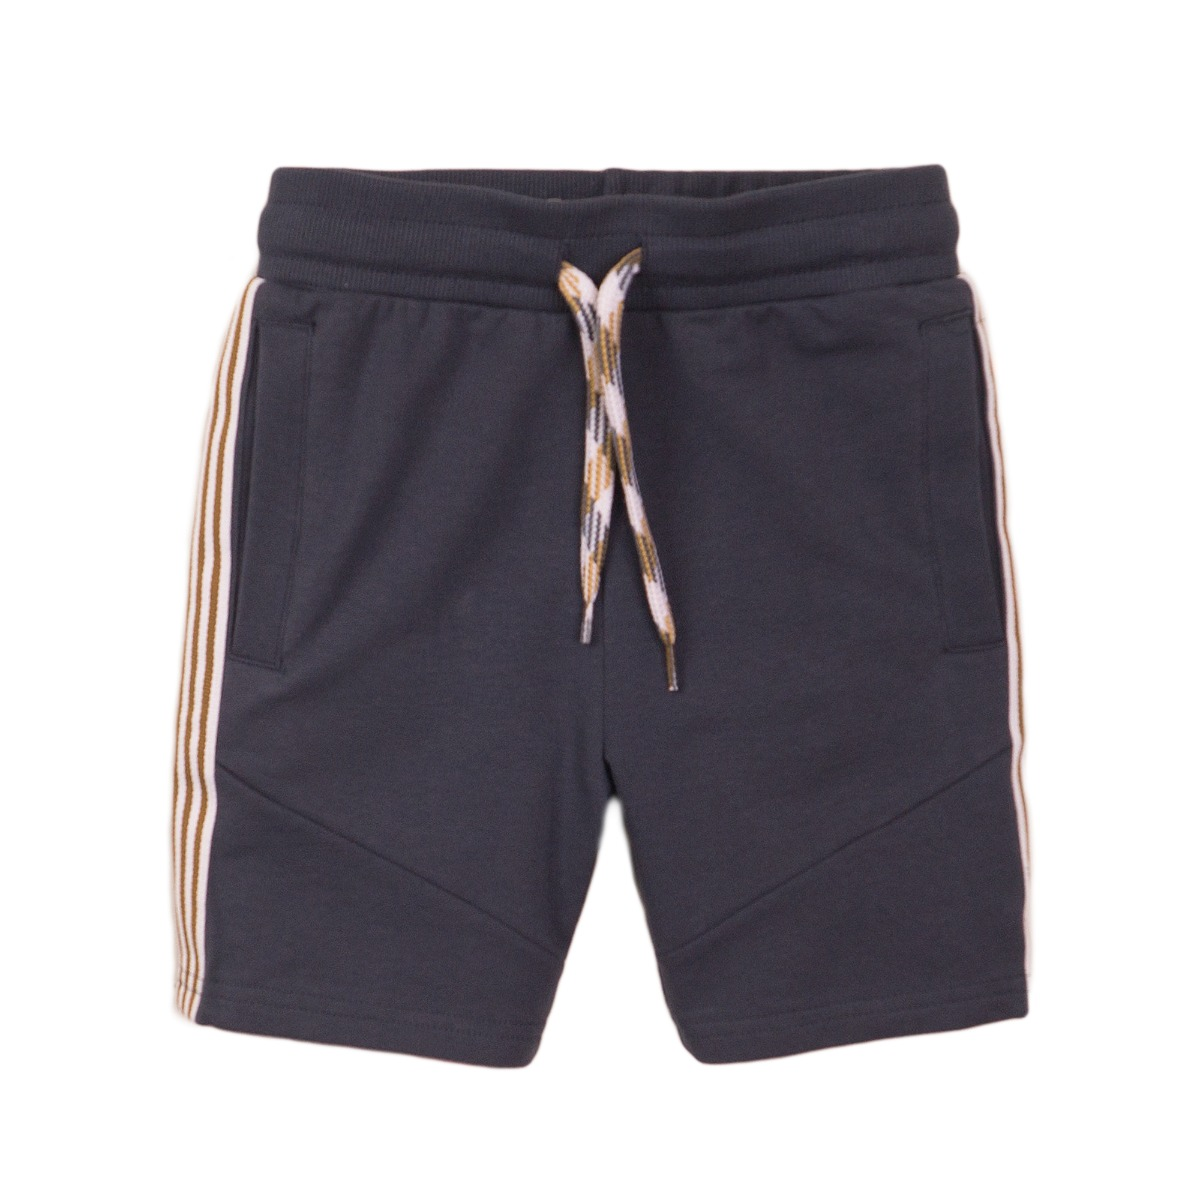 Pantaloni scurti sport Dj Dutchjeans imagine